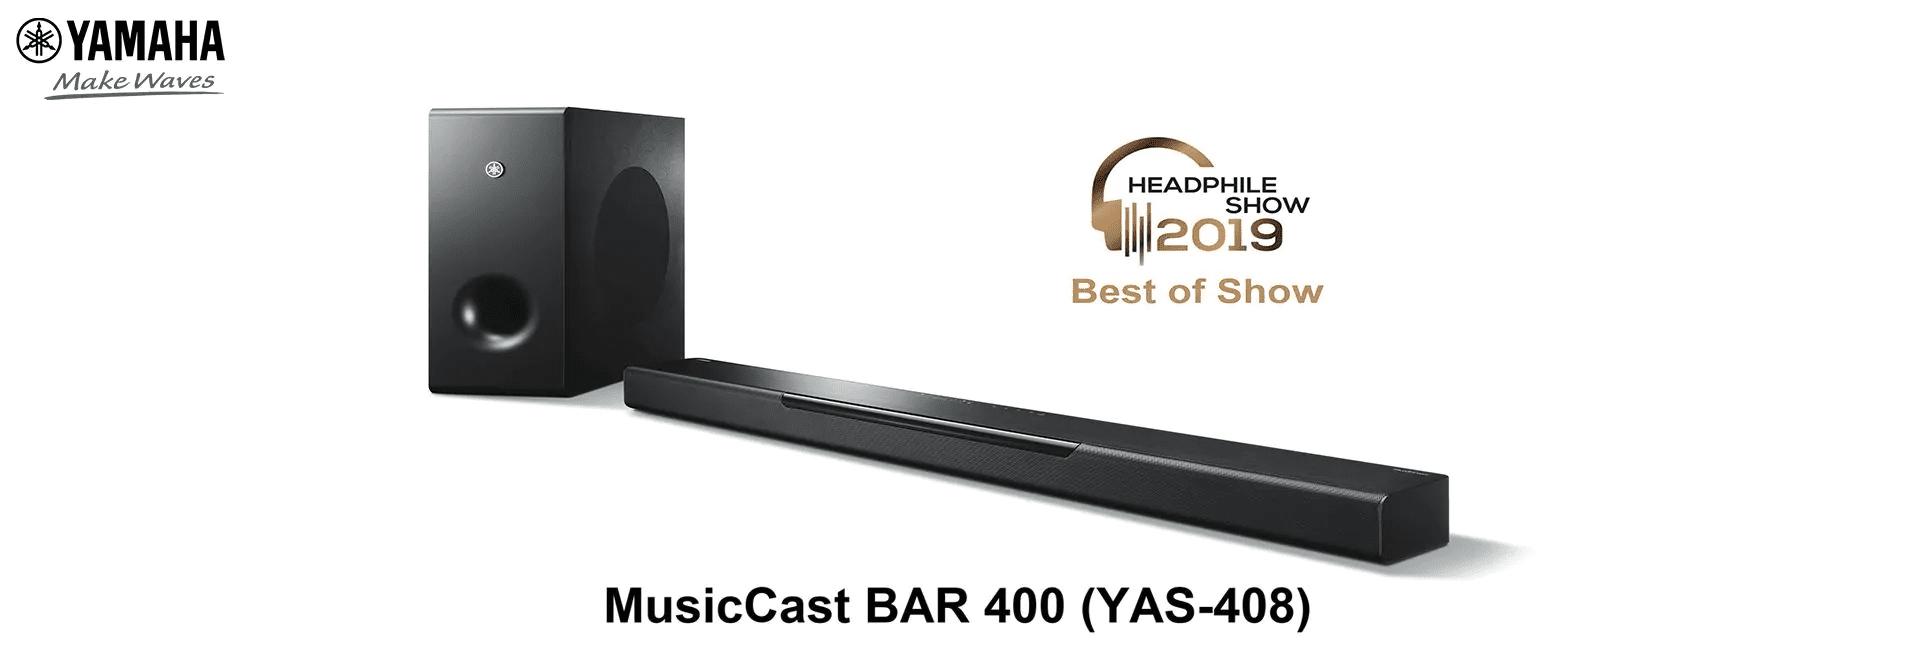 Giải thưởng Best of Show loa Yamaha MusicCast Bar 400